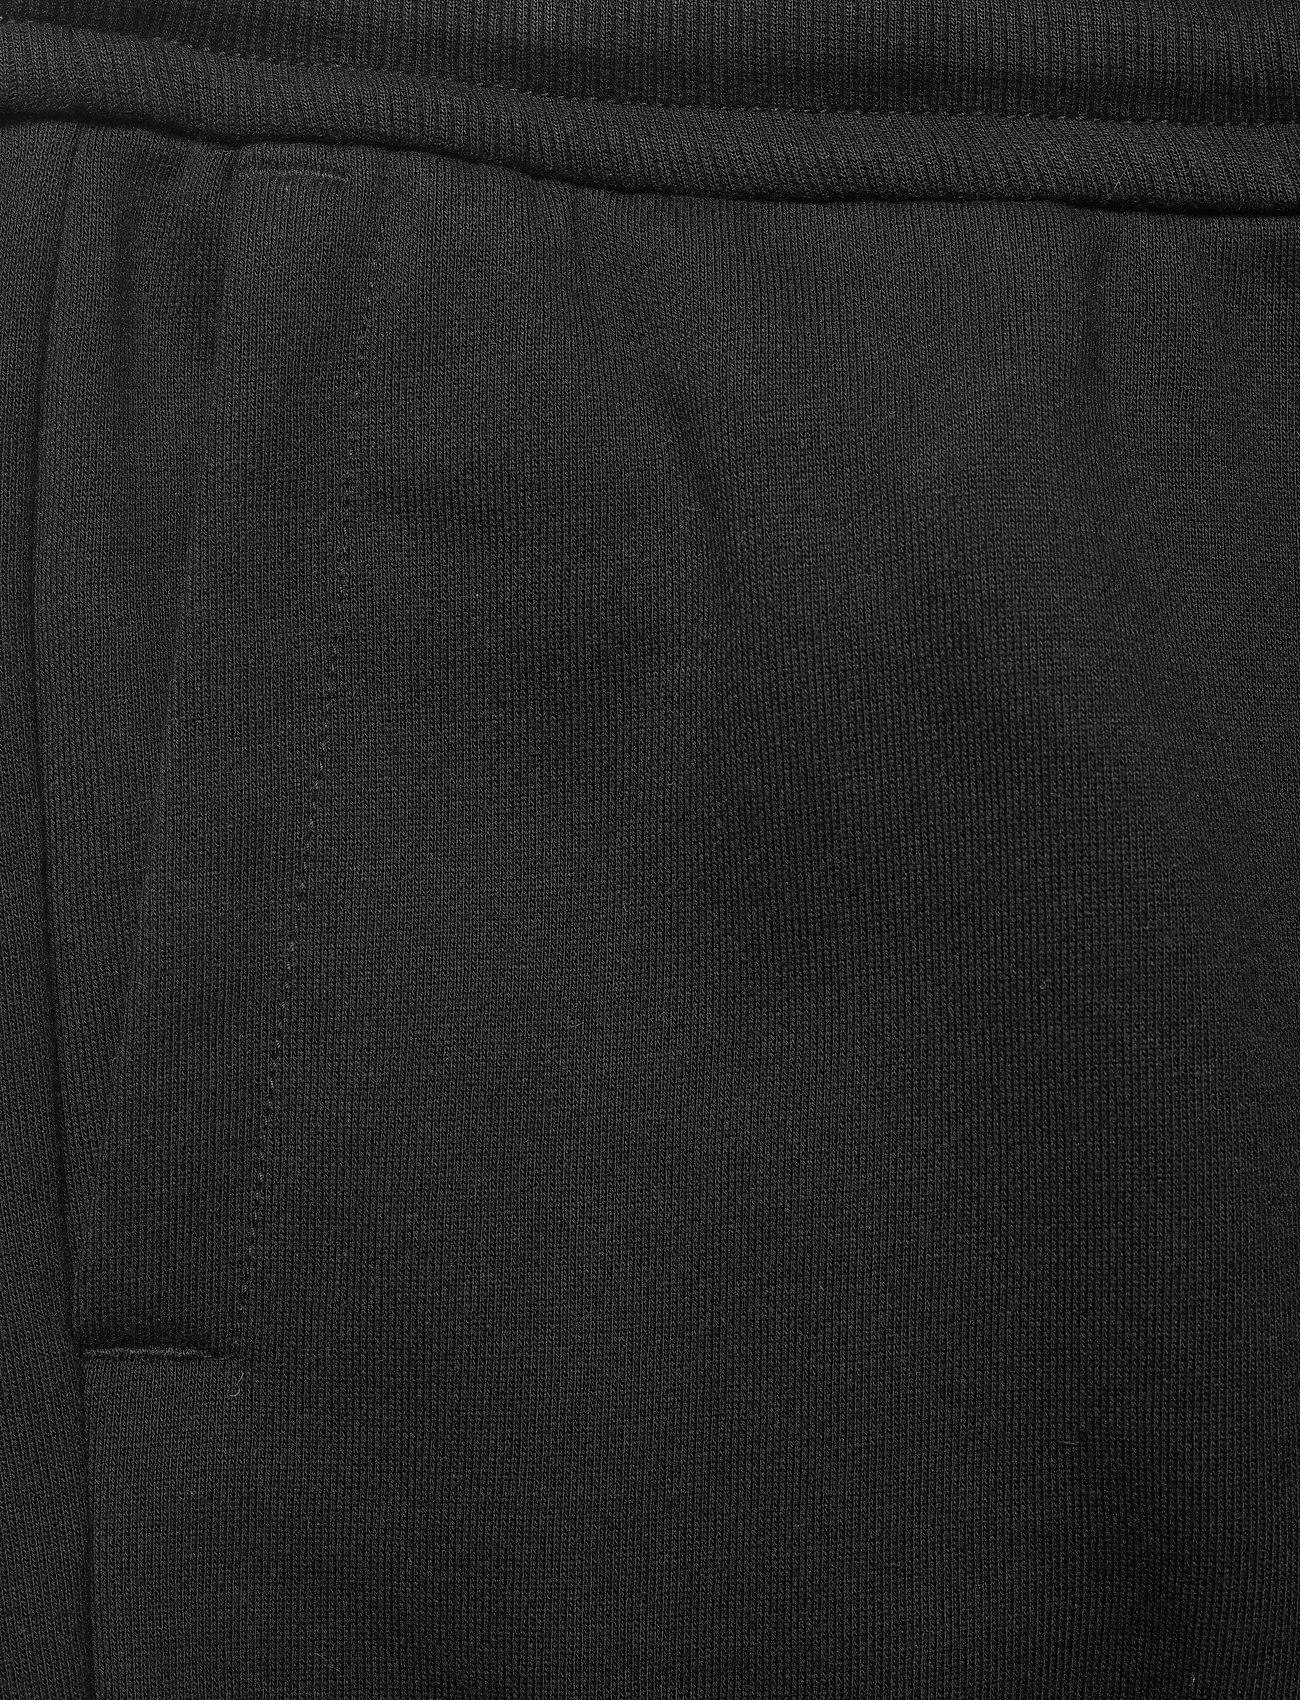 Calvin Klein Jeans - CARGO BADGE FLEECE PANT - cargobroek - ck black - 3